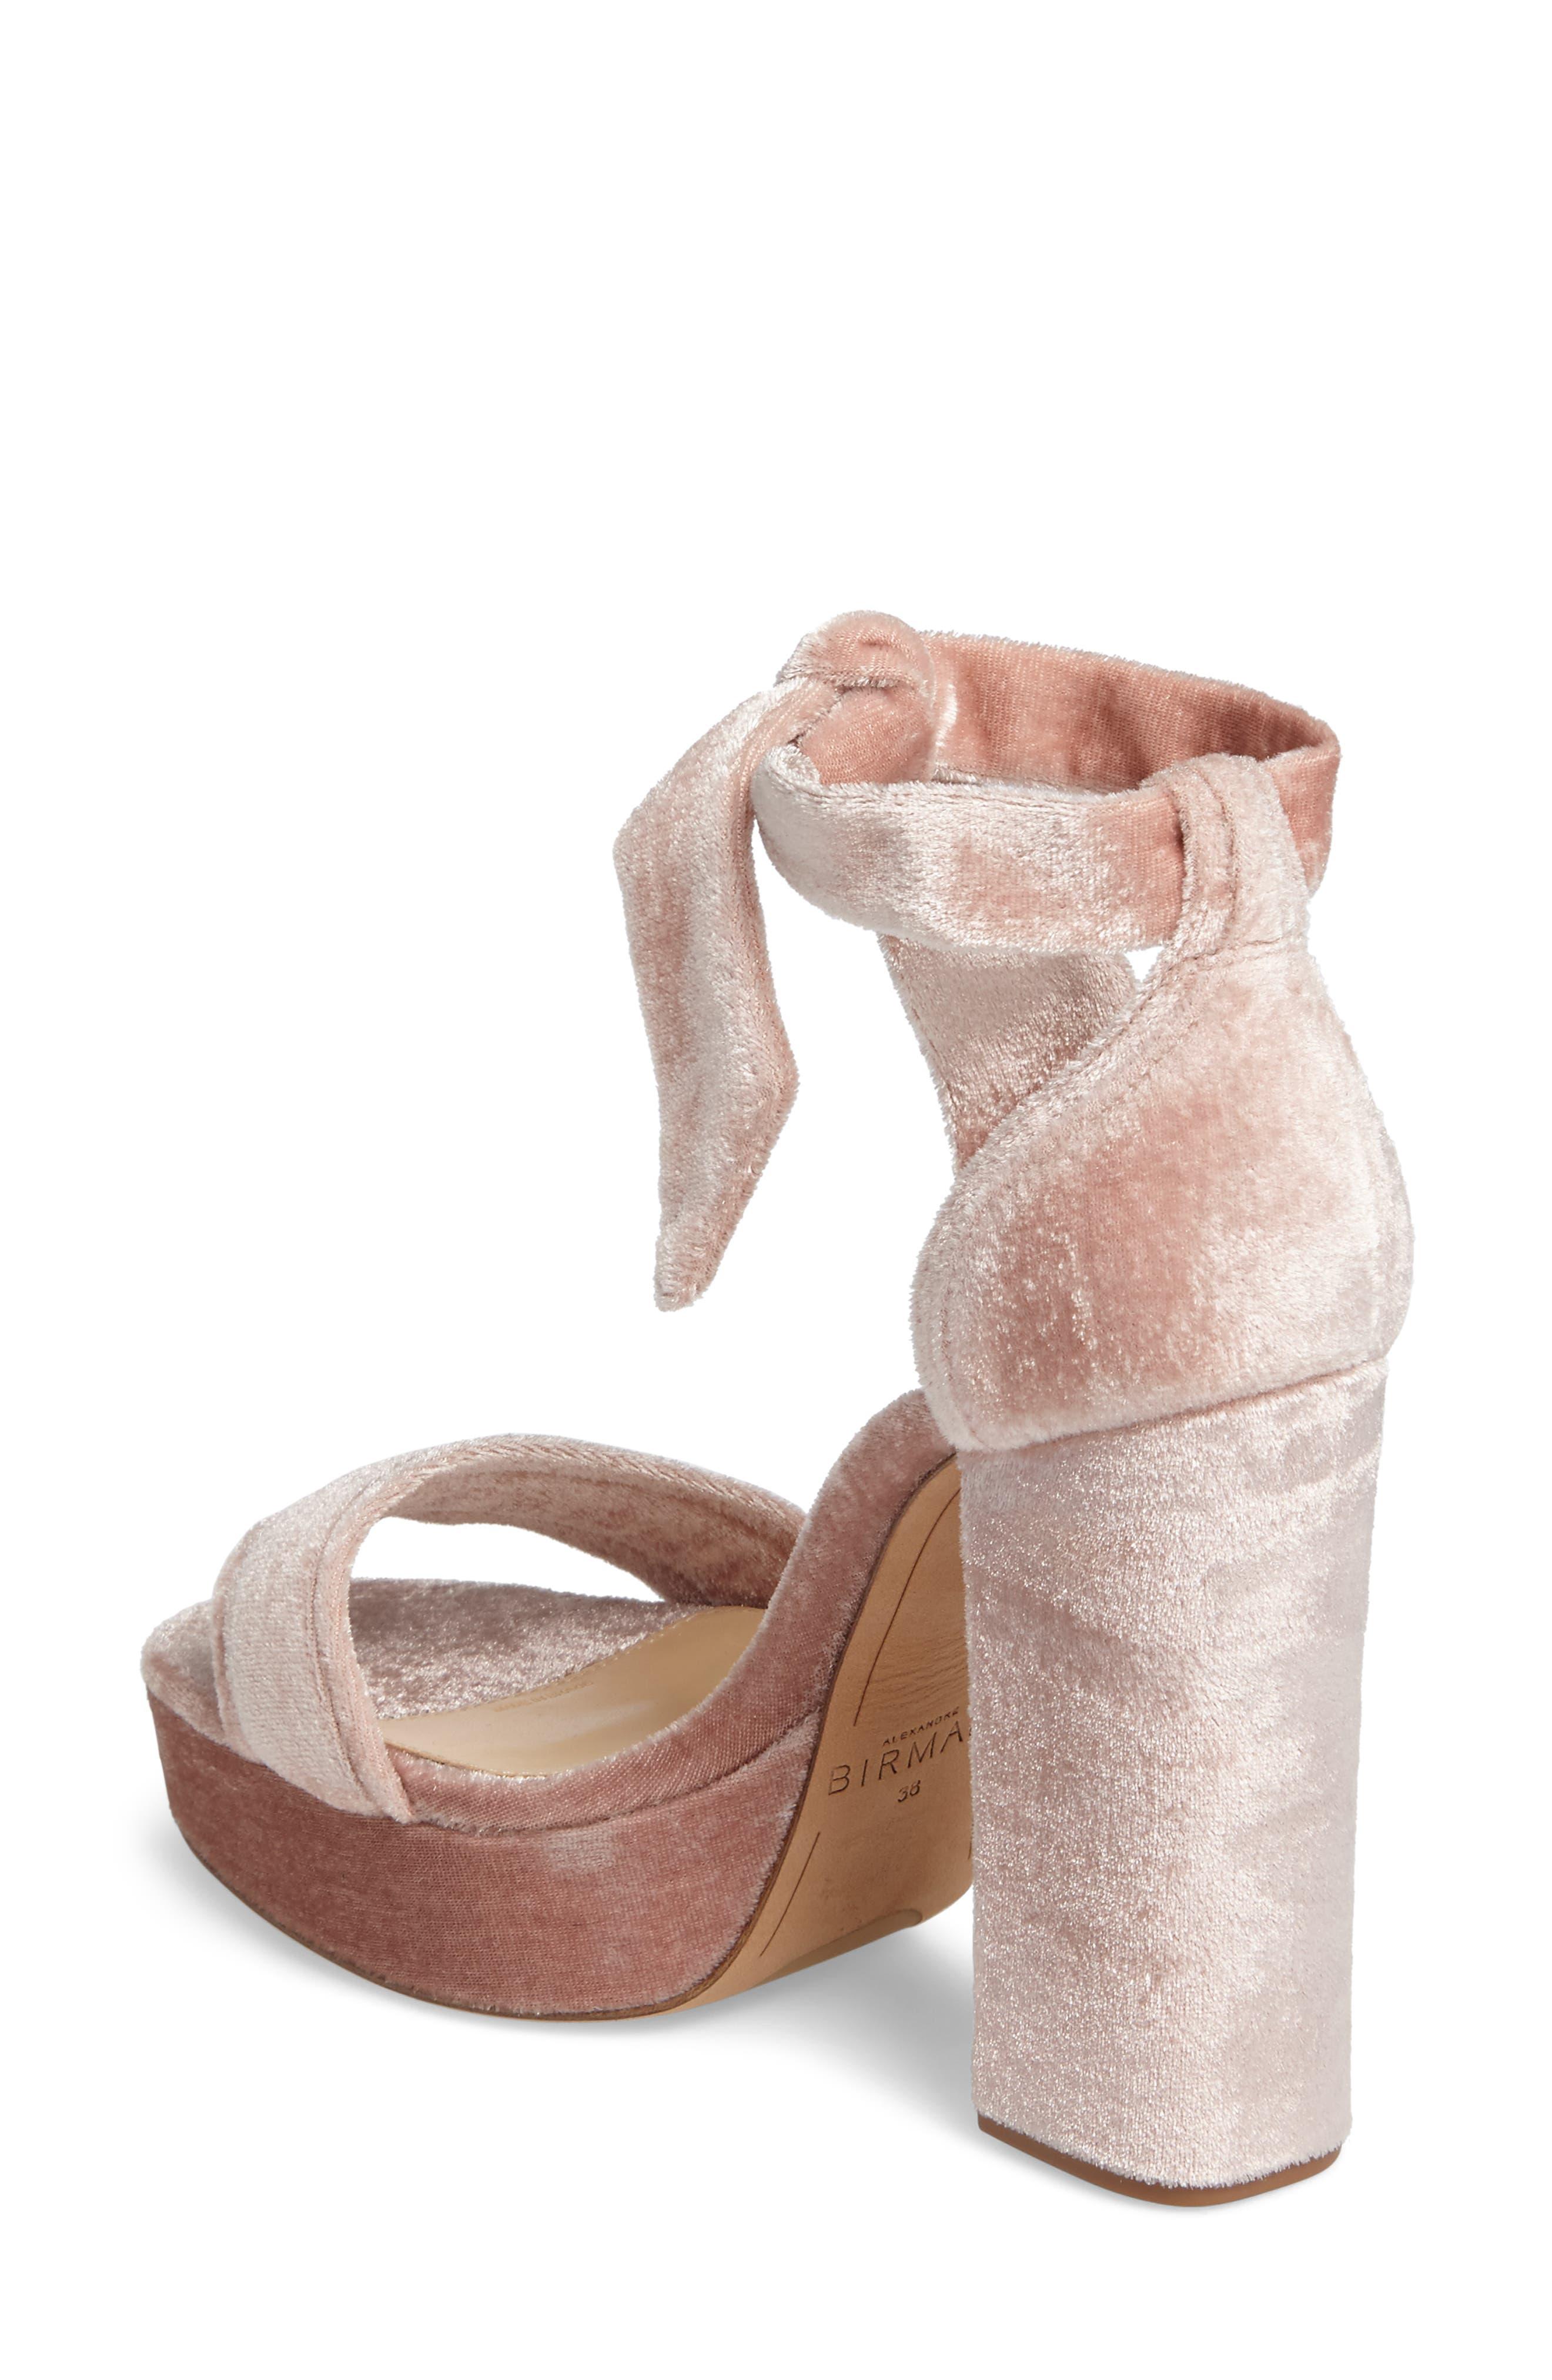 Celine Platform Sandal,                             Alternate thumbnail 4, color,